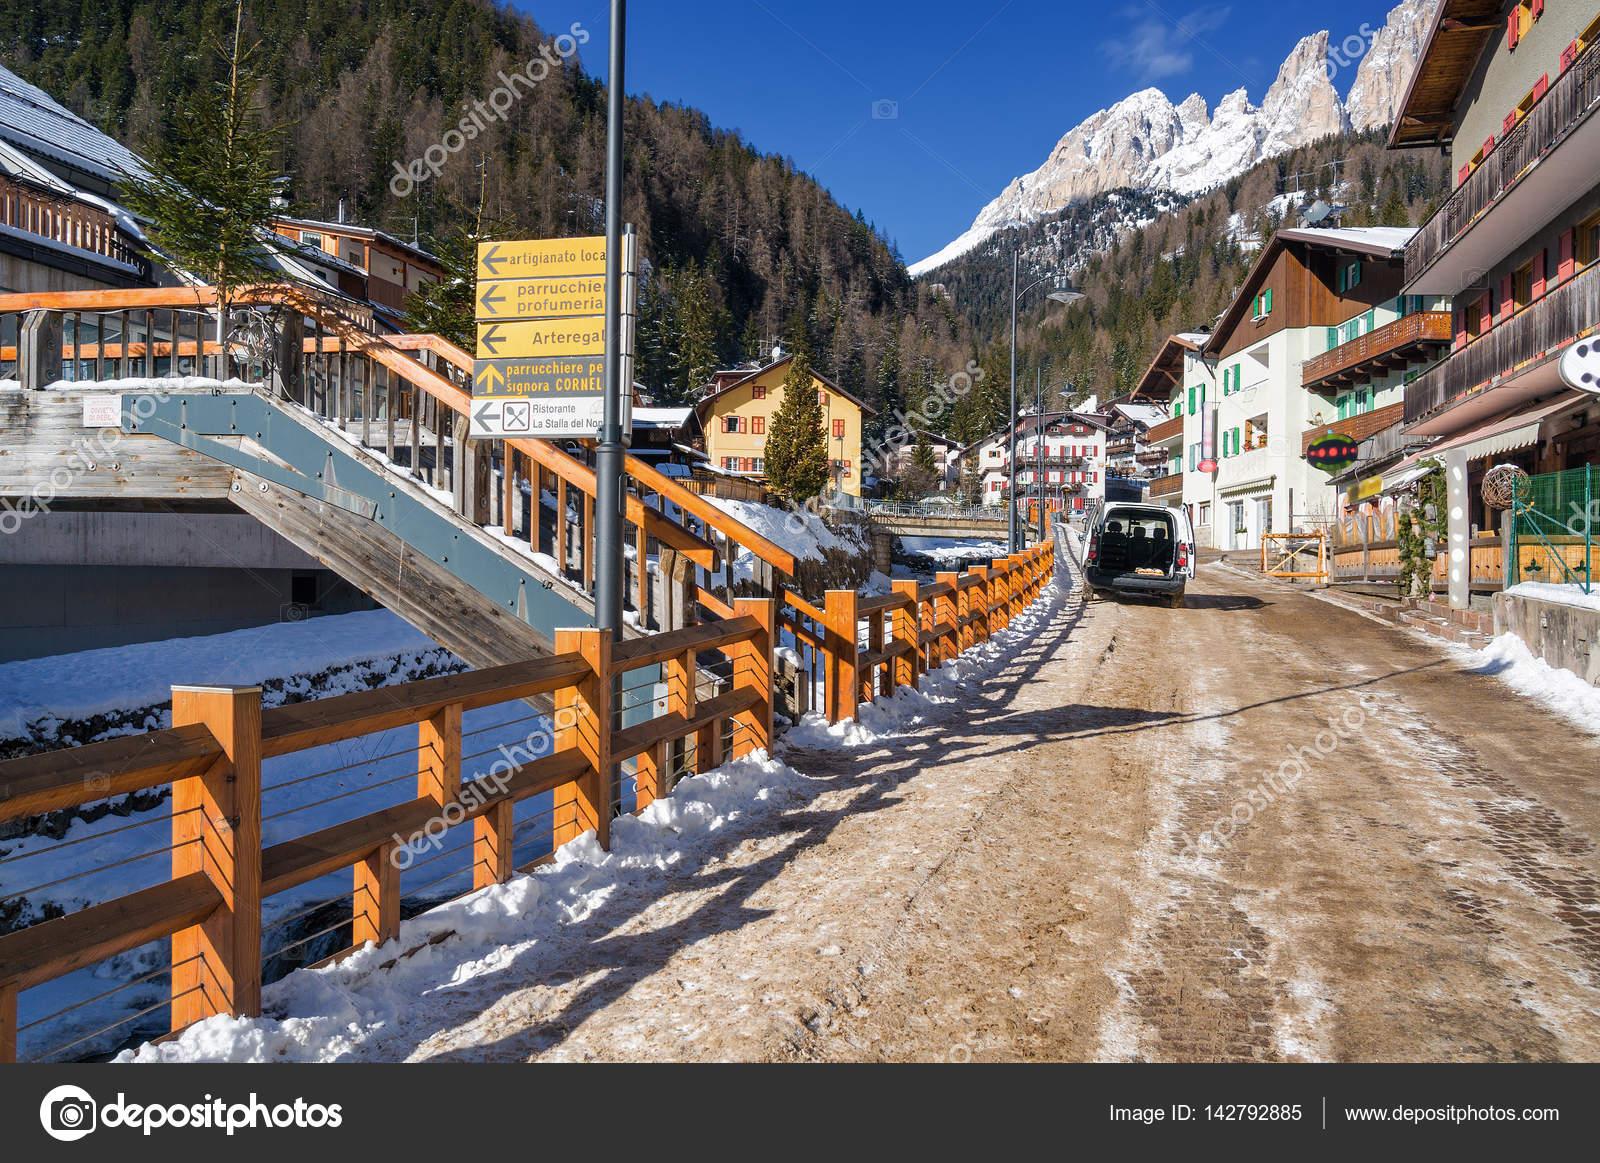 Trentino Alto Adige Artigianato sunny view of campitello on the background of dolomites of